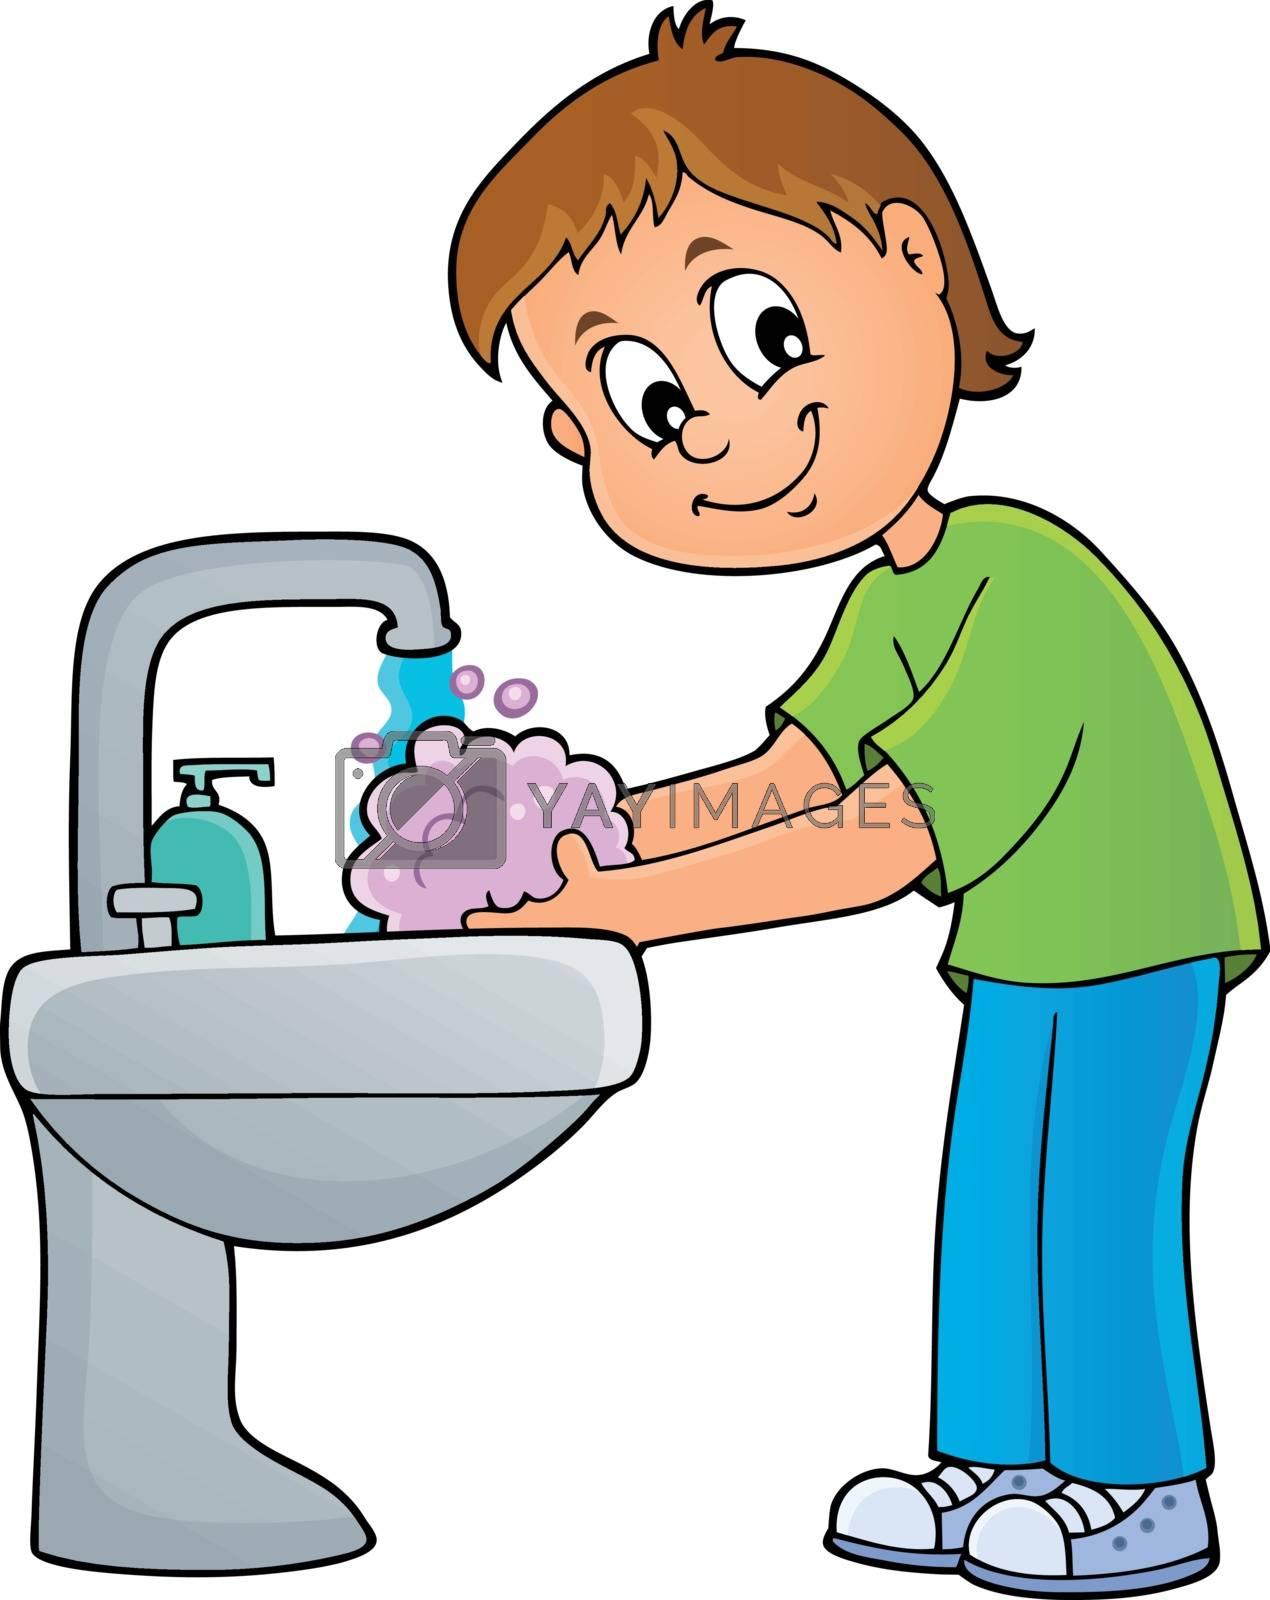 Boy washing hands theme 1 - eps10 vector illustration.